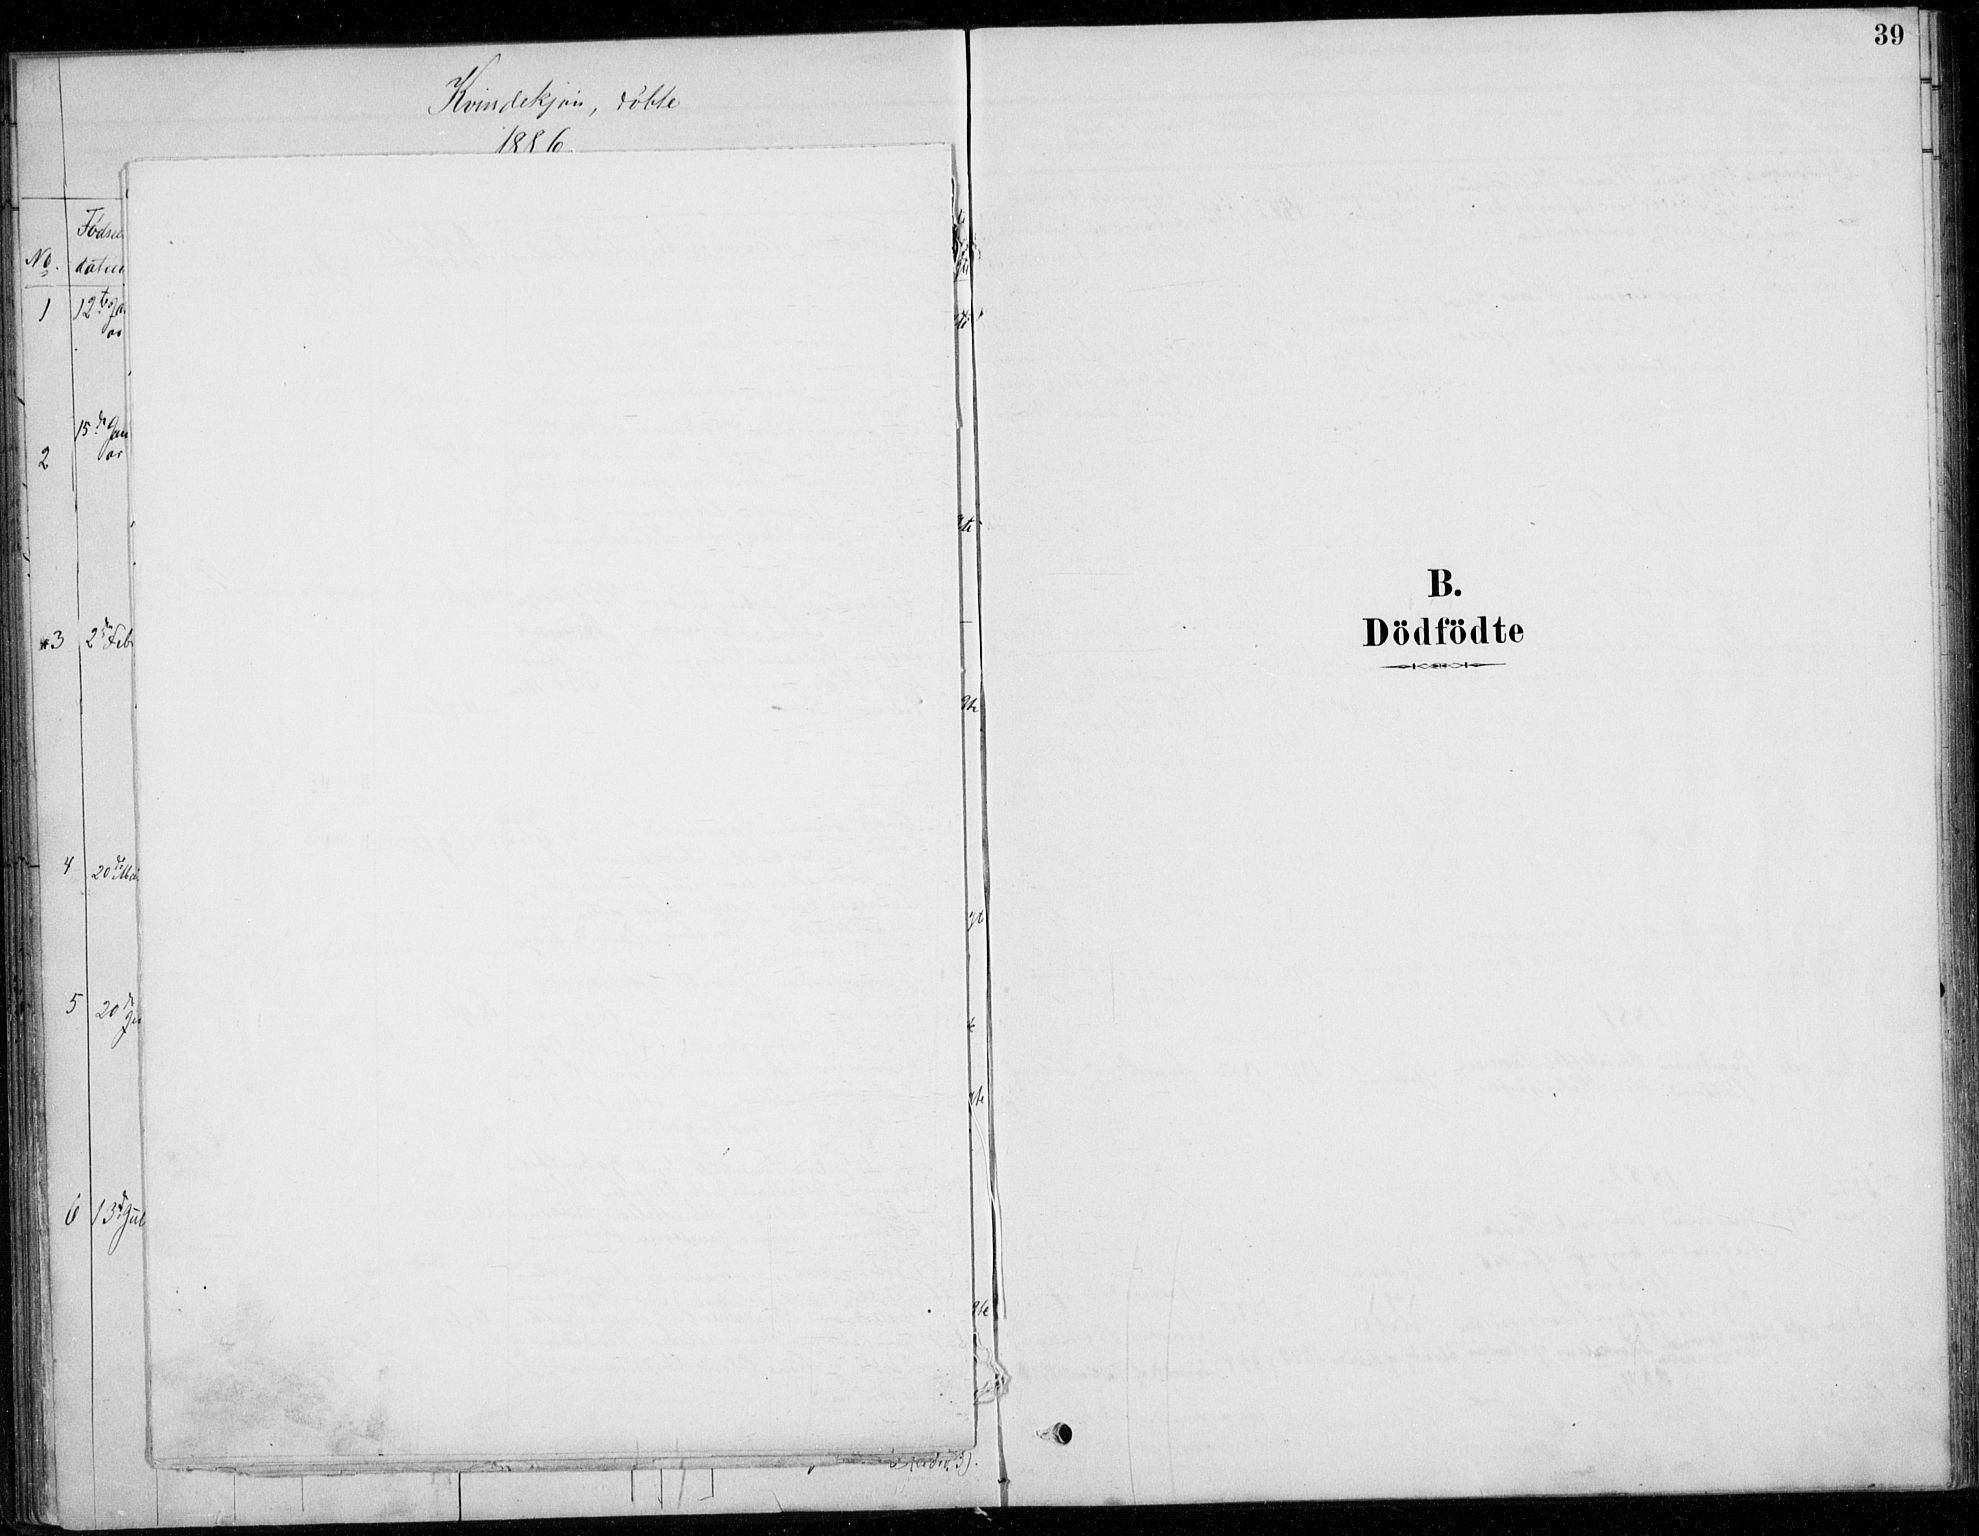 SAO, Fet prestekontor Kirkebøker, G/Gb/L0002: Parish register (copy) no. II 2, 1878-1911, p. 39